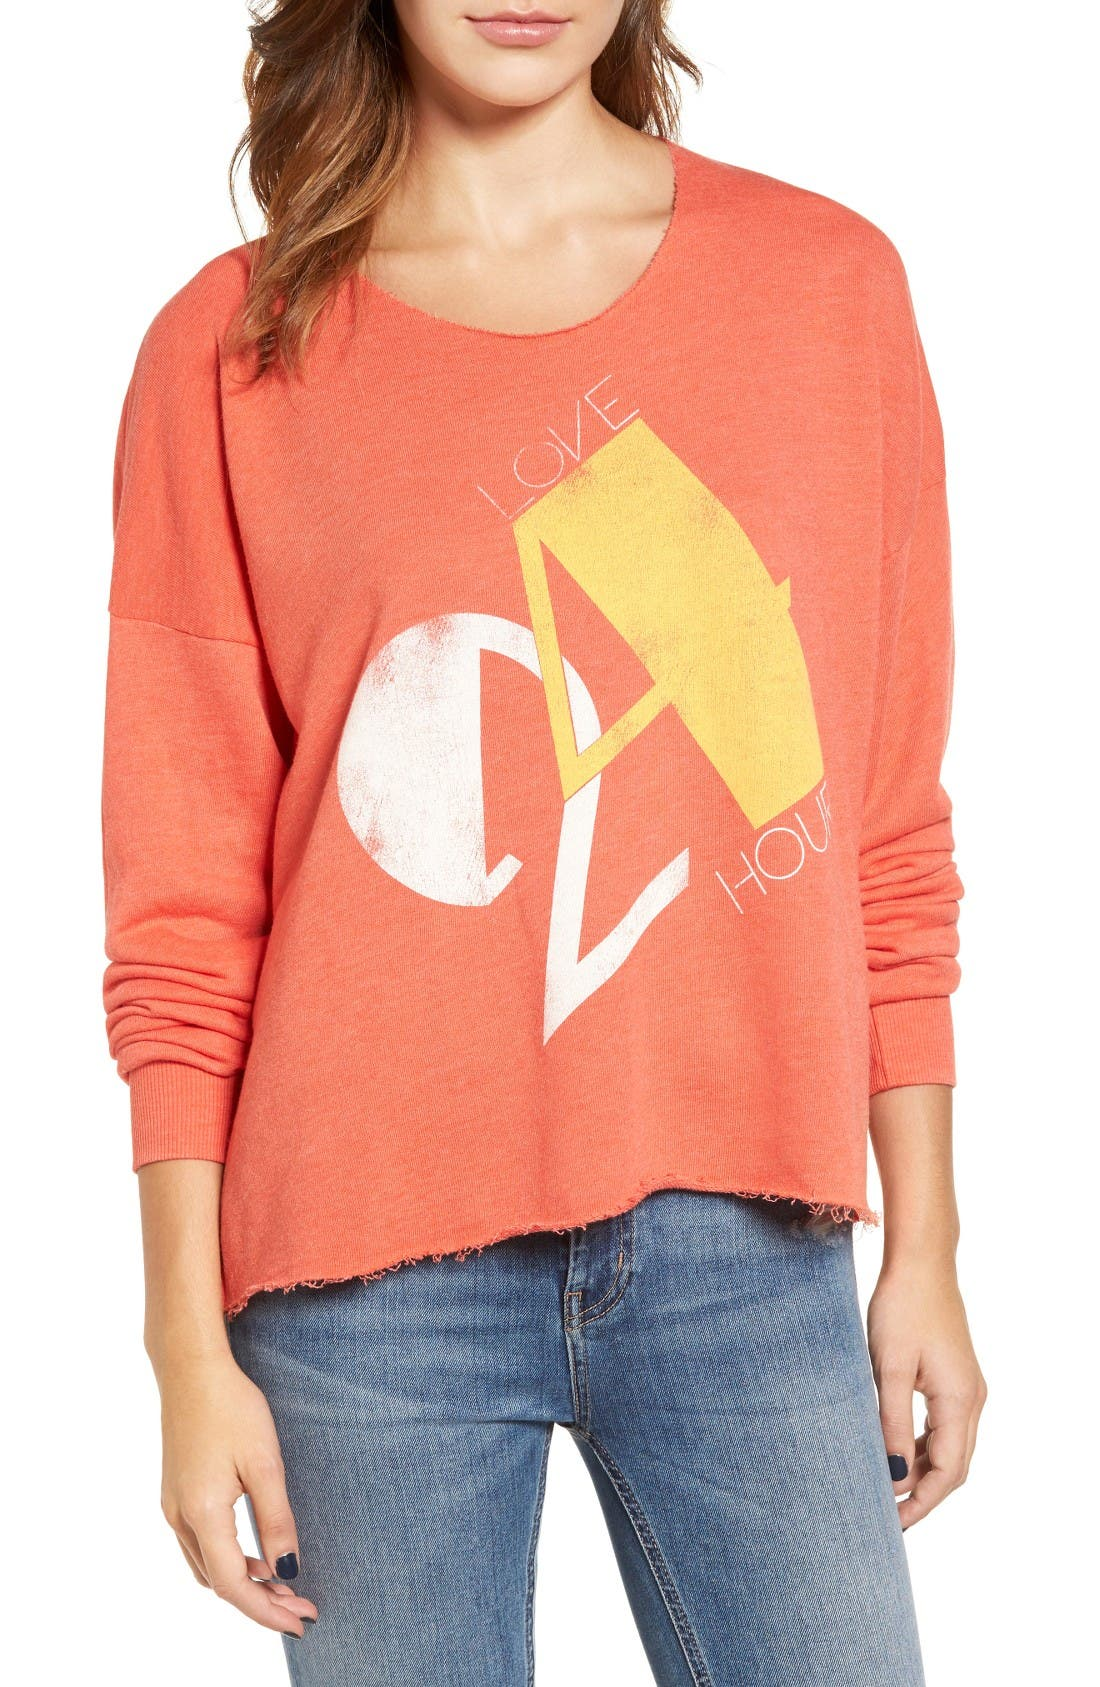 Wildfox Love 24/7 Sweatshirt